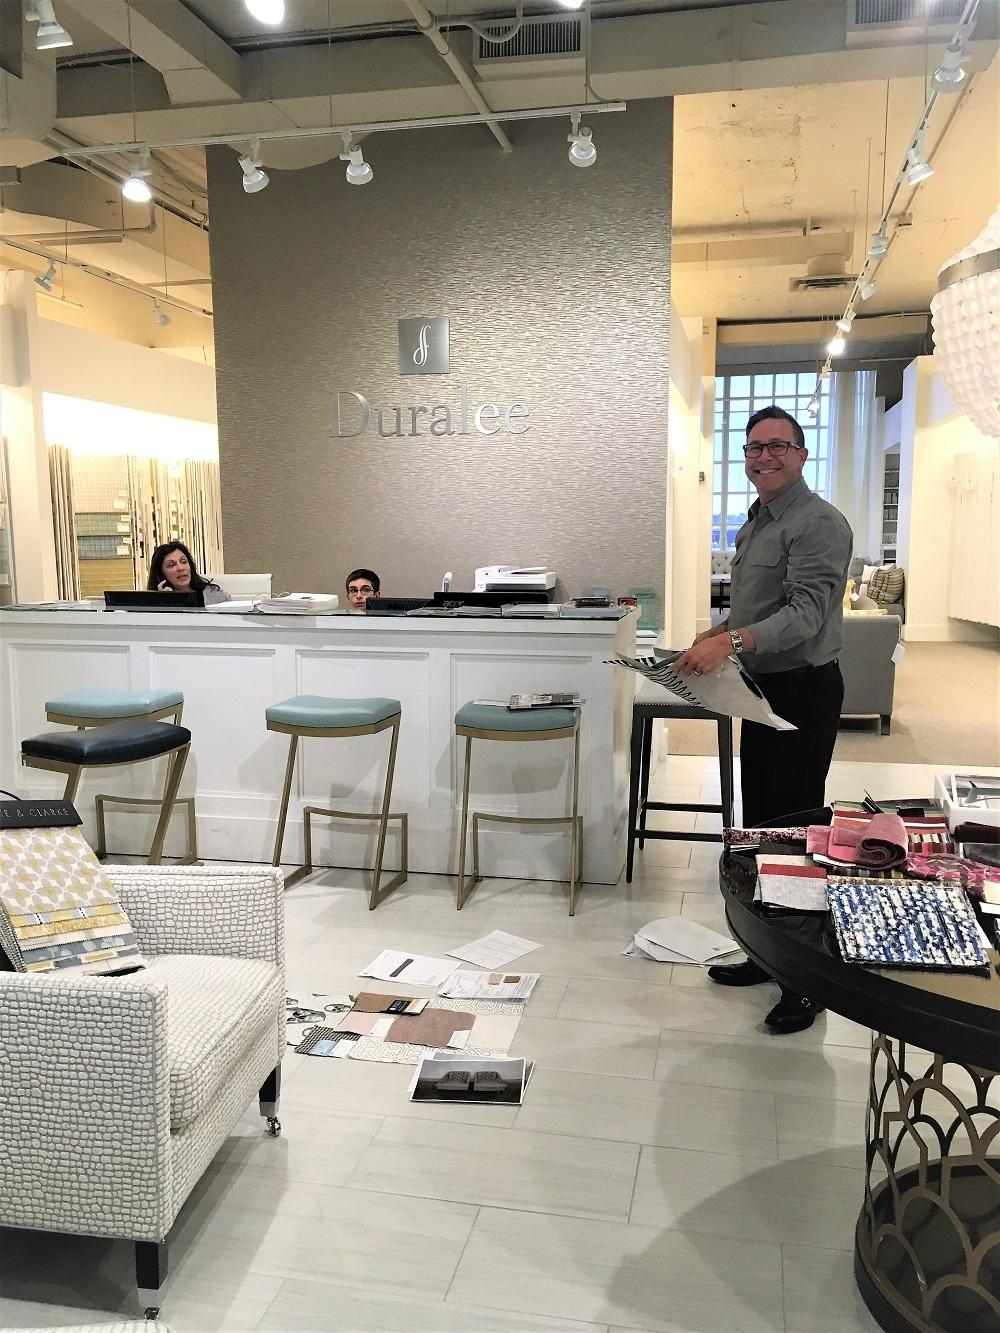 Duralee Showroom Manager, Gary Fisher with Renee Julian, Showroom Fabric Representative